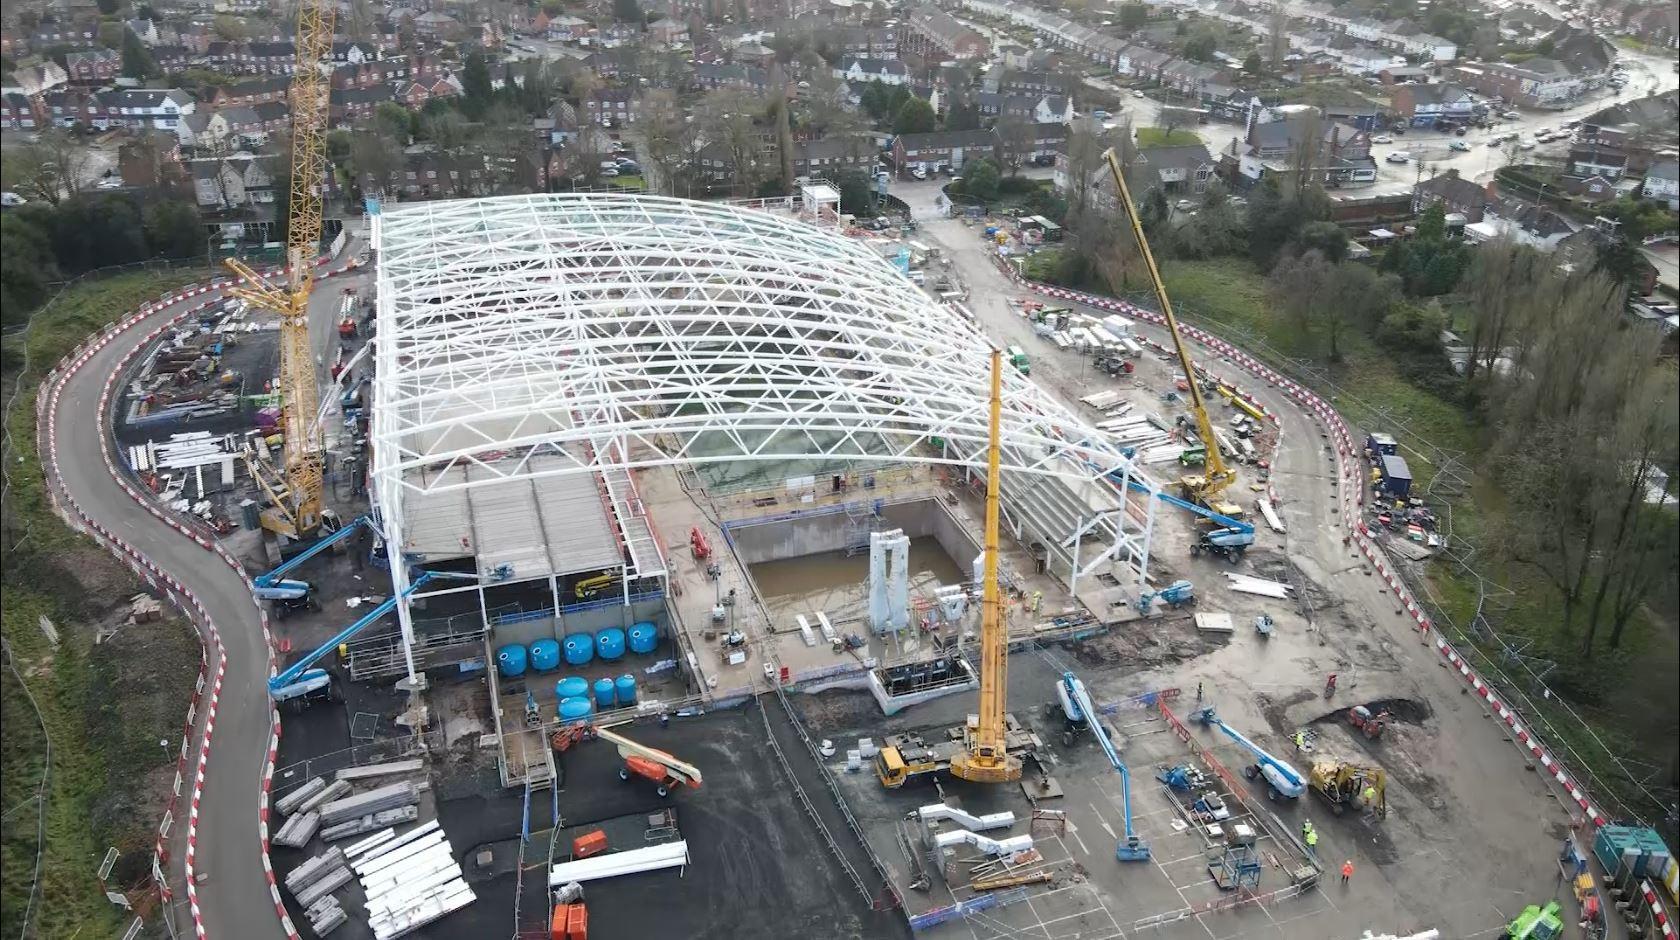 "Peaty views Birmingham 2022 Aquatics Centre as ""national investment"""